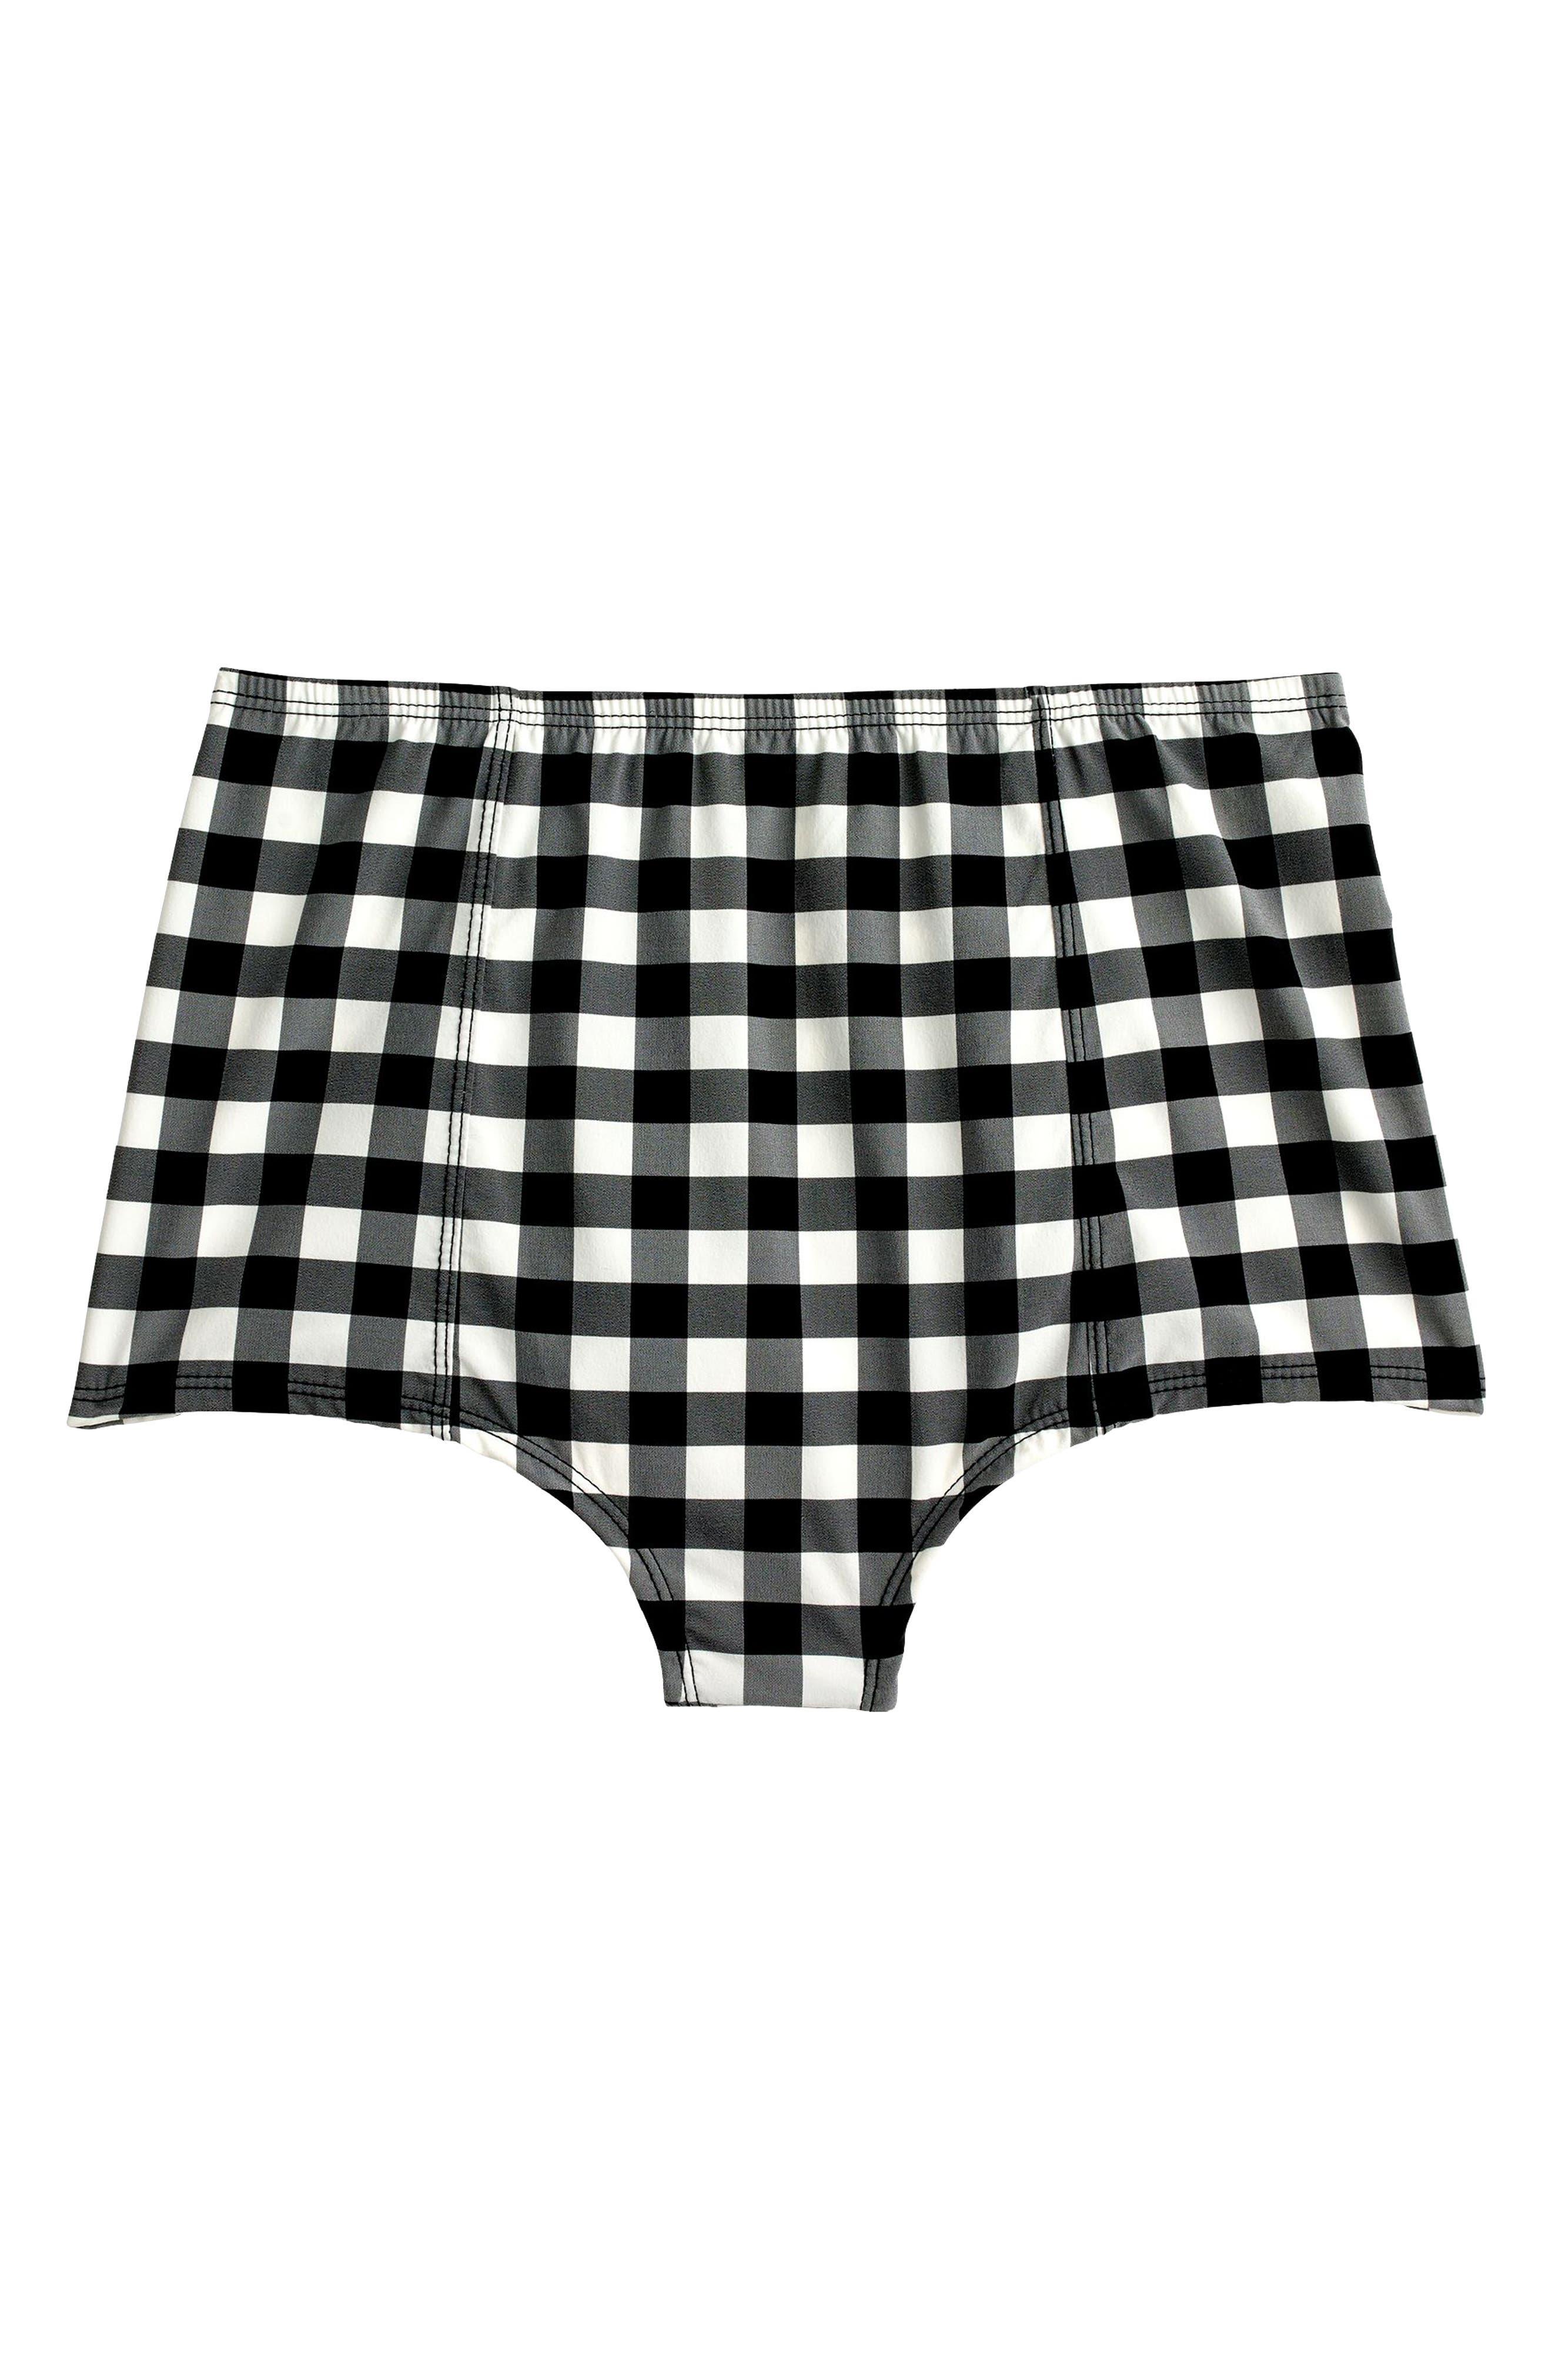 J.Crew High Waist Bikini Bottoms,                             Alternate thumbnail 3, color,                             Ivory/ Black